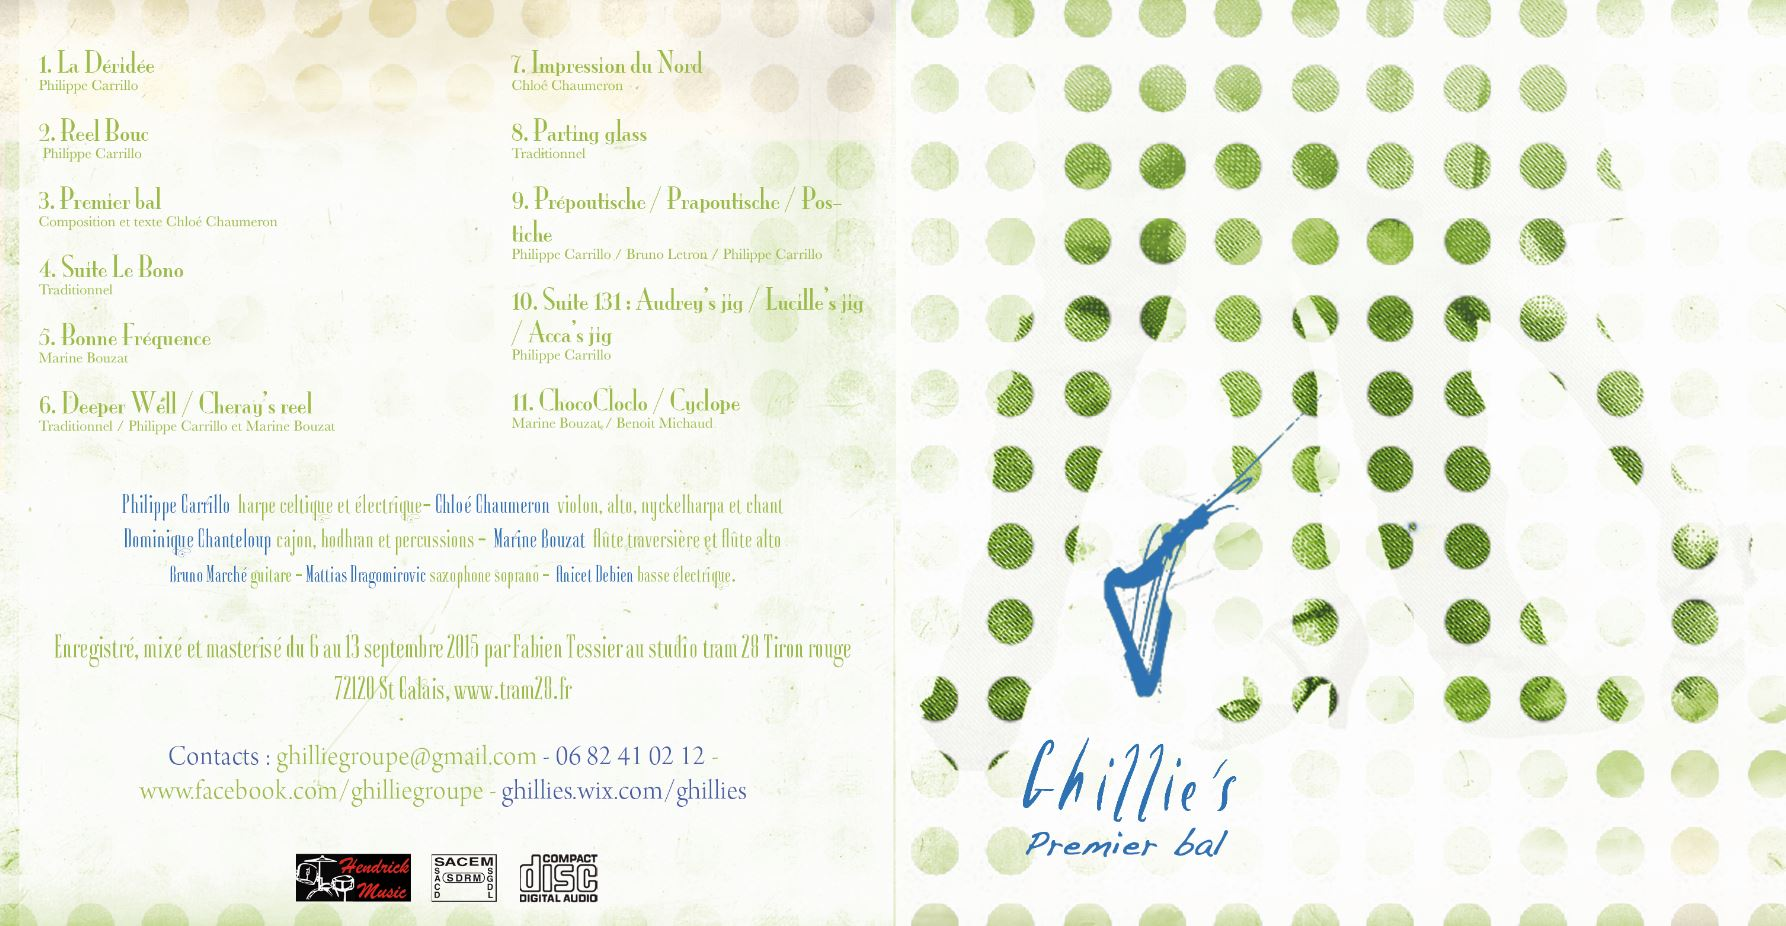 Album Ghillie's Irish and Folk music septembre 2015